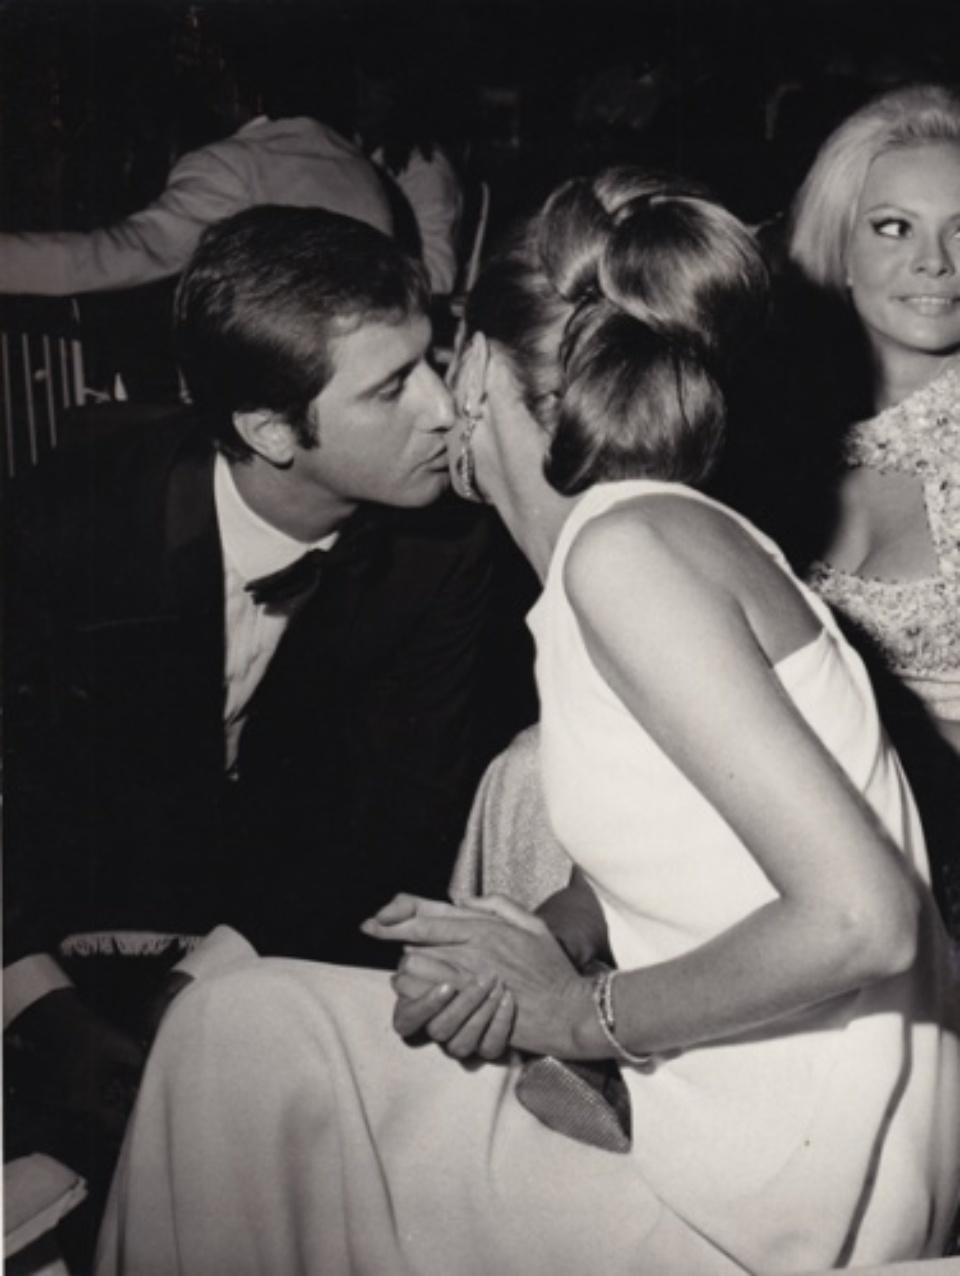 Vintage Press: Photograph Capucine mit ihrem Verlobten Gianfranco Piacentini 1967 Vintage gelatin silver print 18,2 x 23,9 cm